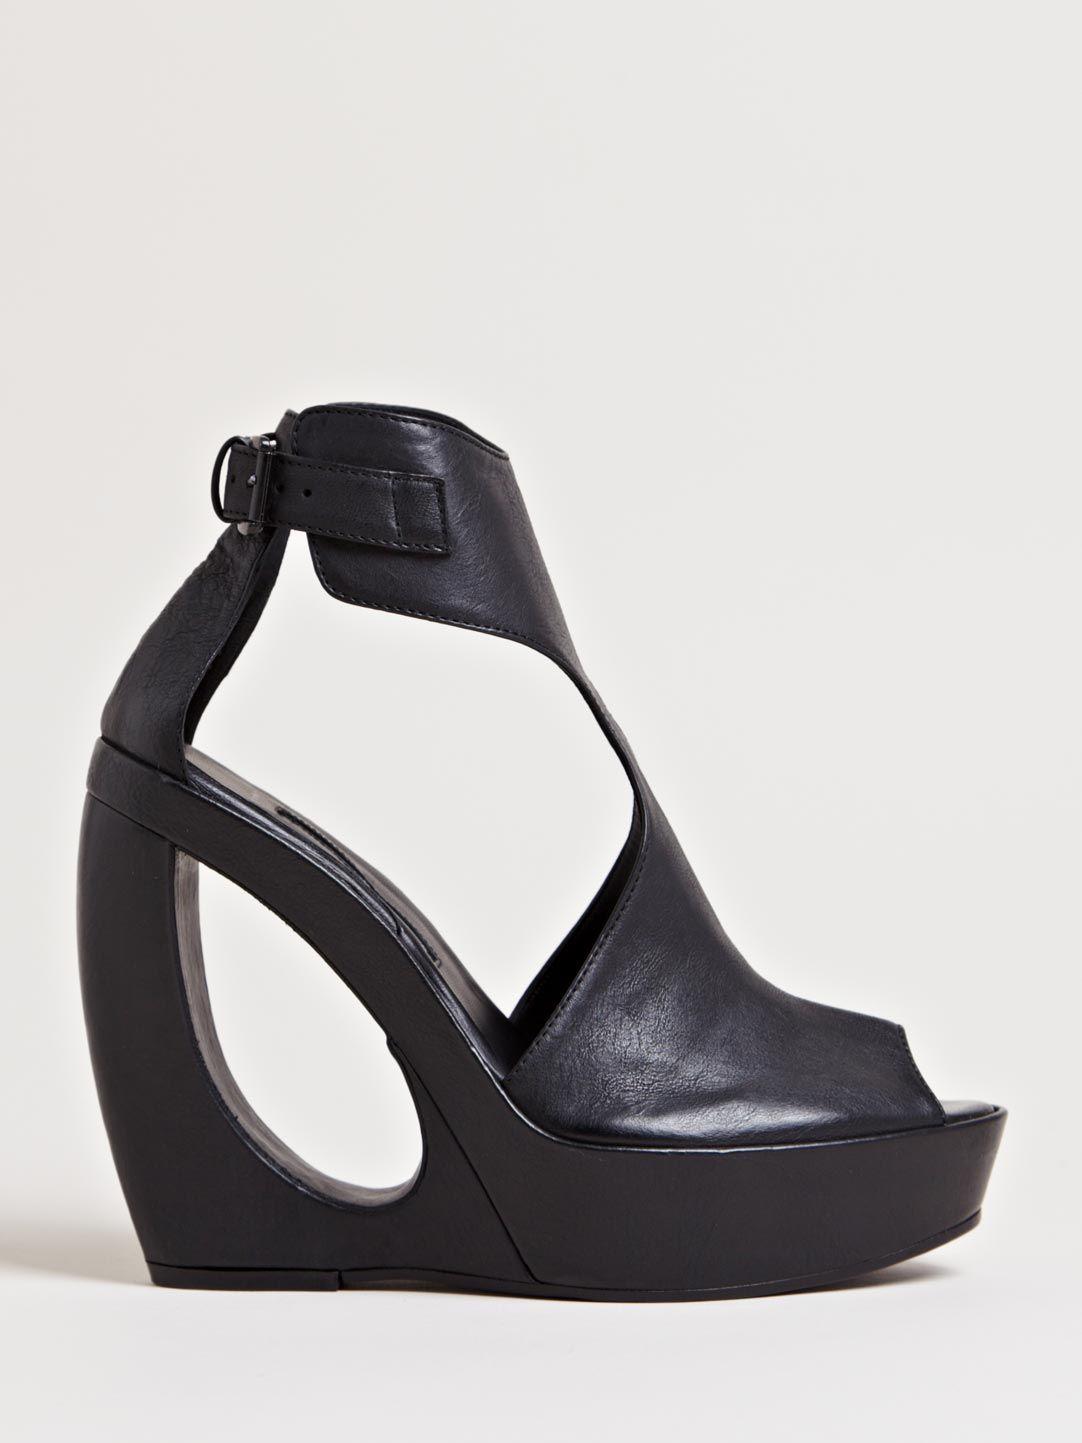 Ann Demeulemeester Women s Curved Vitello Heels  c52a253ae2